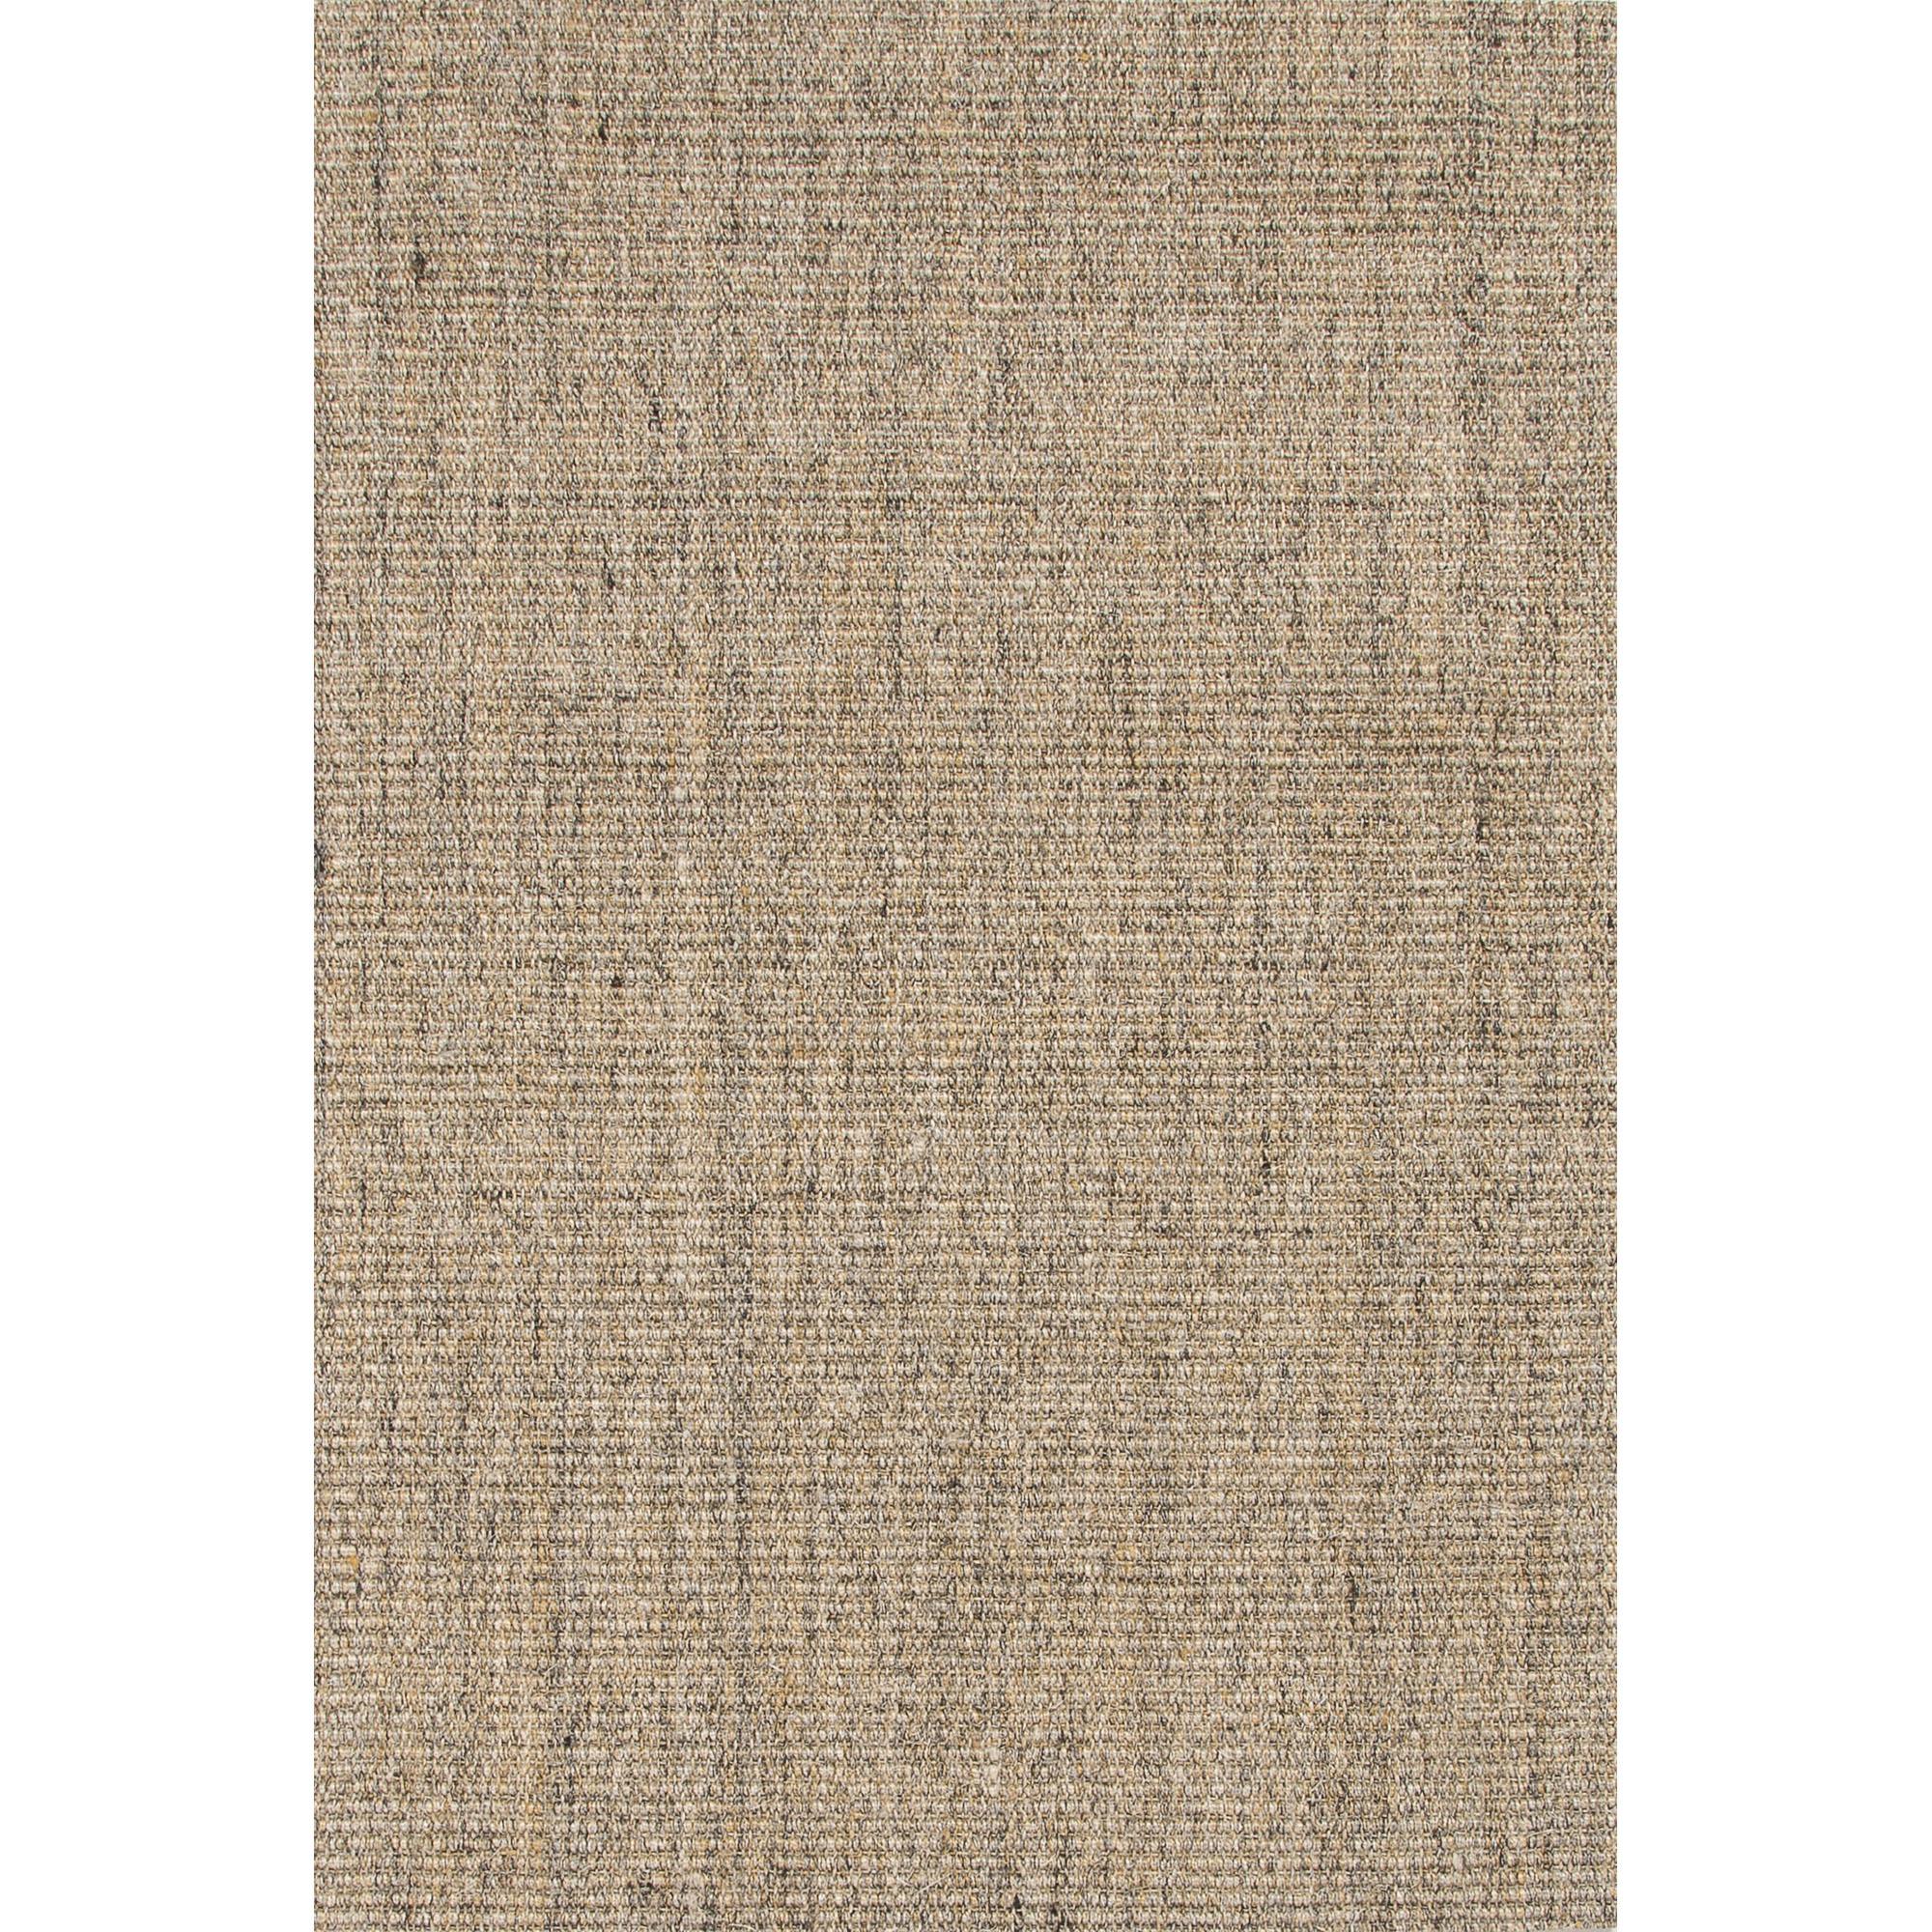 JAIPUR Rugs Naturals Sanibel 3 x 5 Rug - Item Number: RUG119153